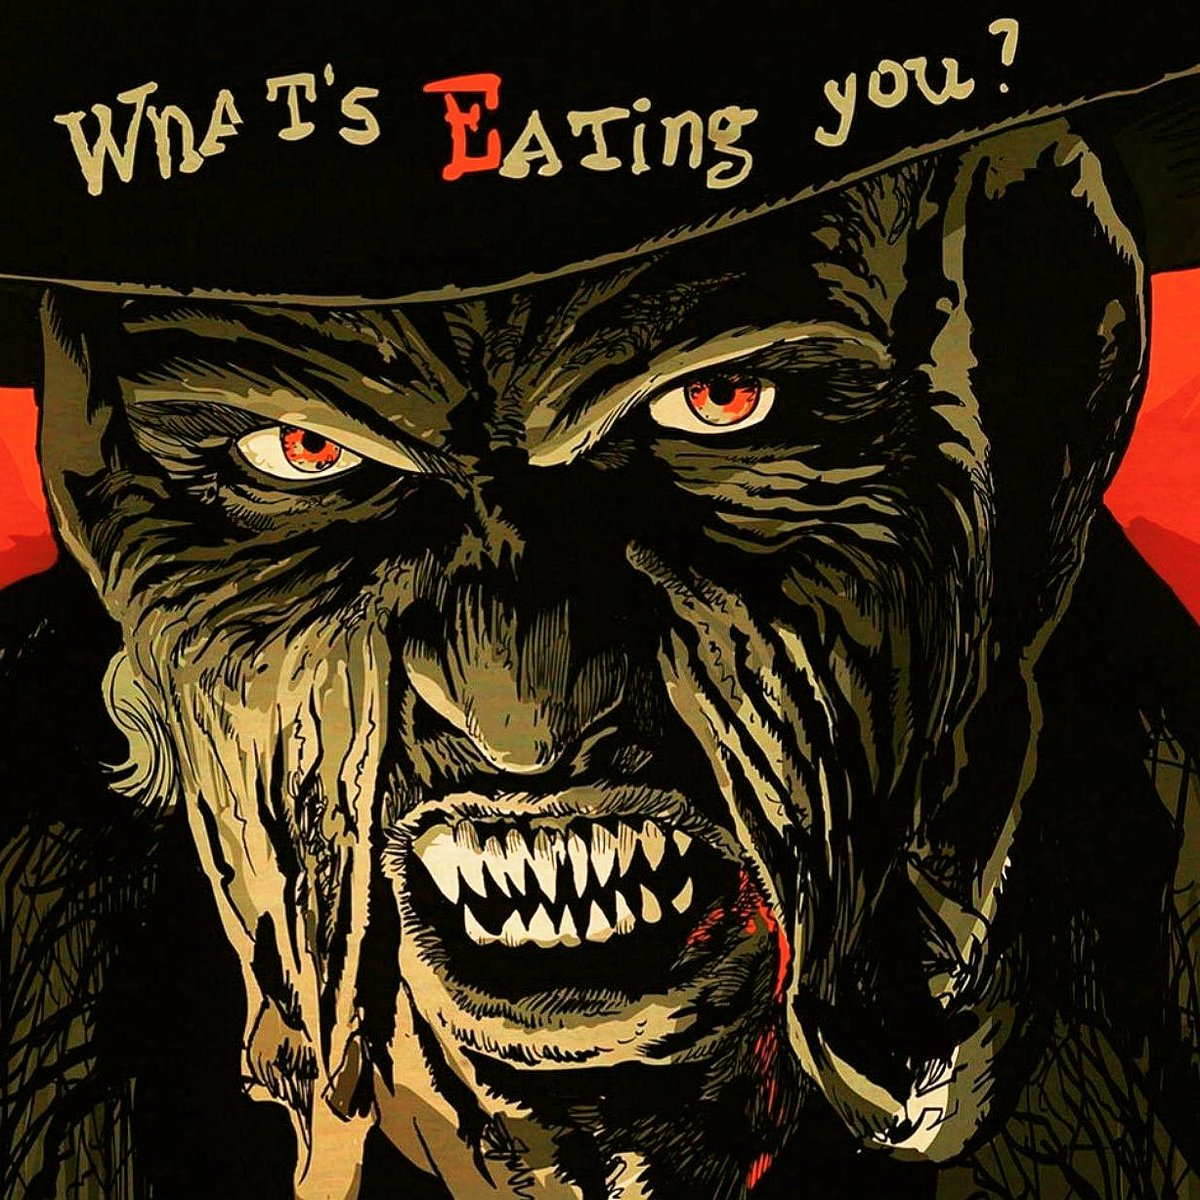 #horror #horrormovies #halloween #art #horrorfan #scary #creepy #horrormovie #movie #film #horrorart #horrorfilm #movies #terror #spooky #gore #dark #horroraddict #thriller #s #cosplay #goth #cinema #blood #instahorror #horrorcollector #horrorjunkie #horrorcommunity #horrorfilmspic.twitter.com/ueoujhfFGE